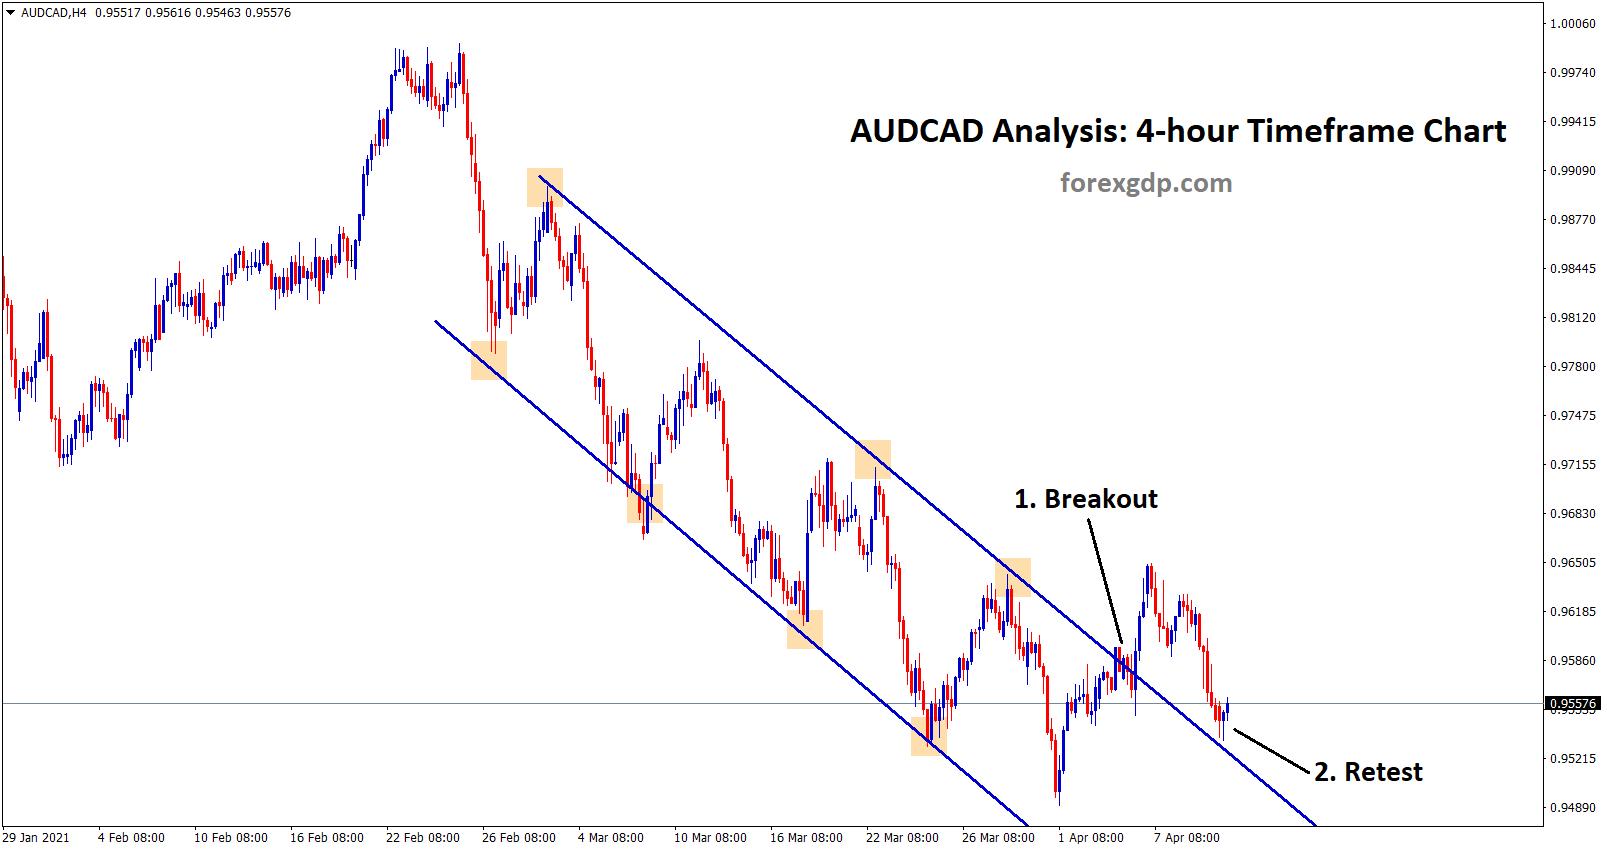 audcad breakout and retest scenario in 4 hr chart